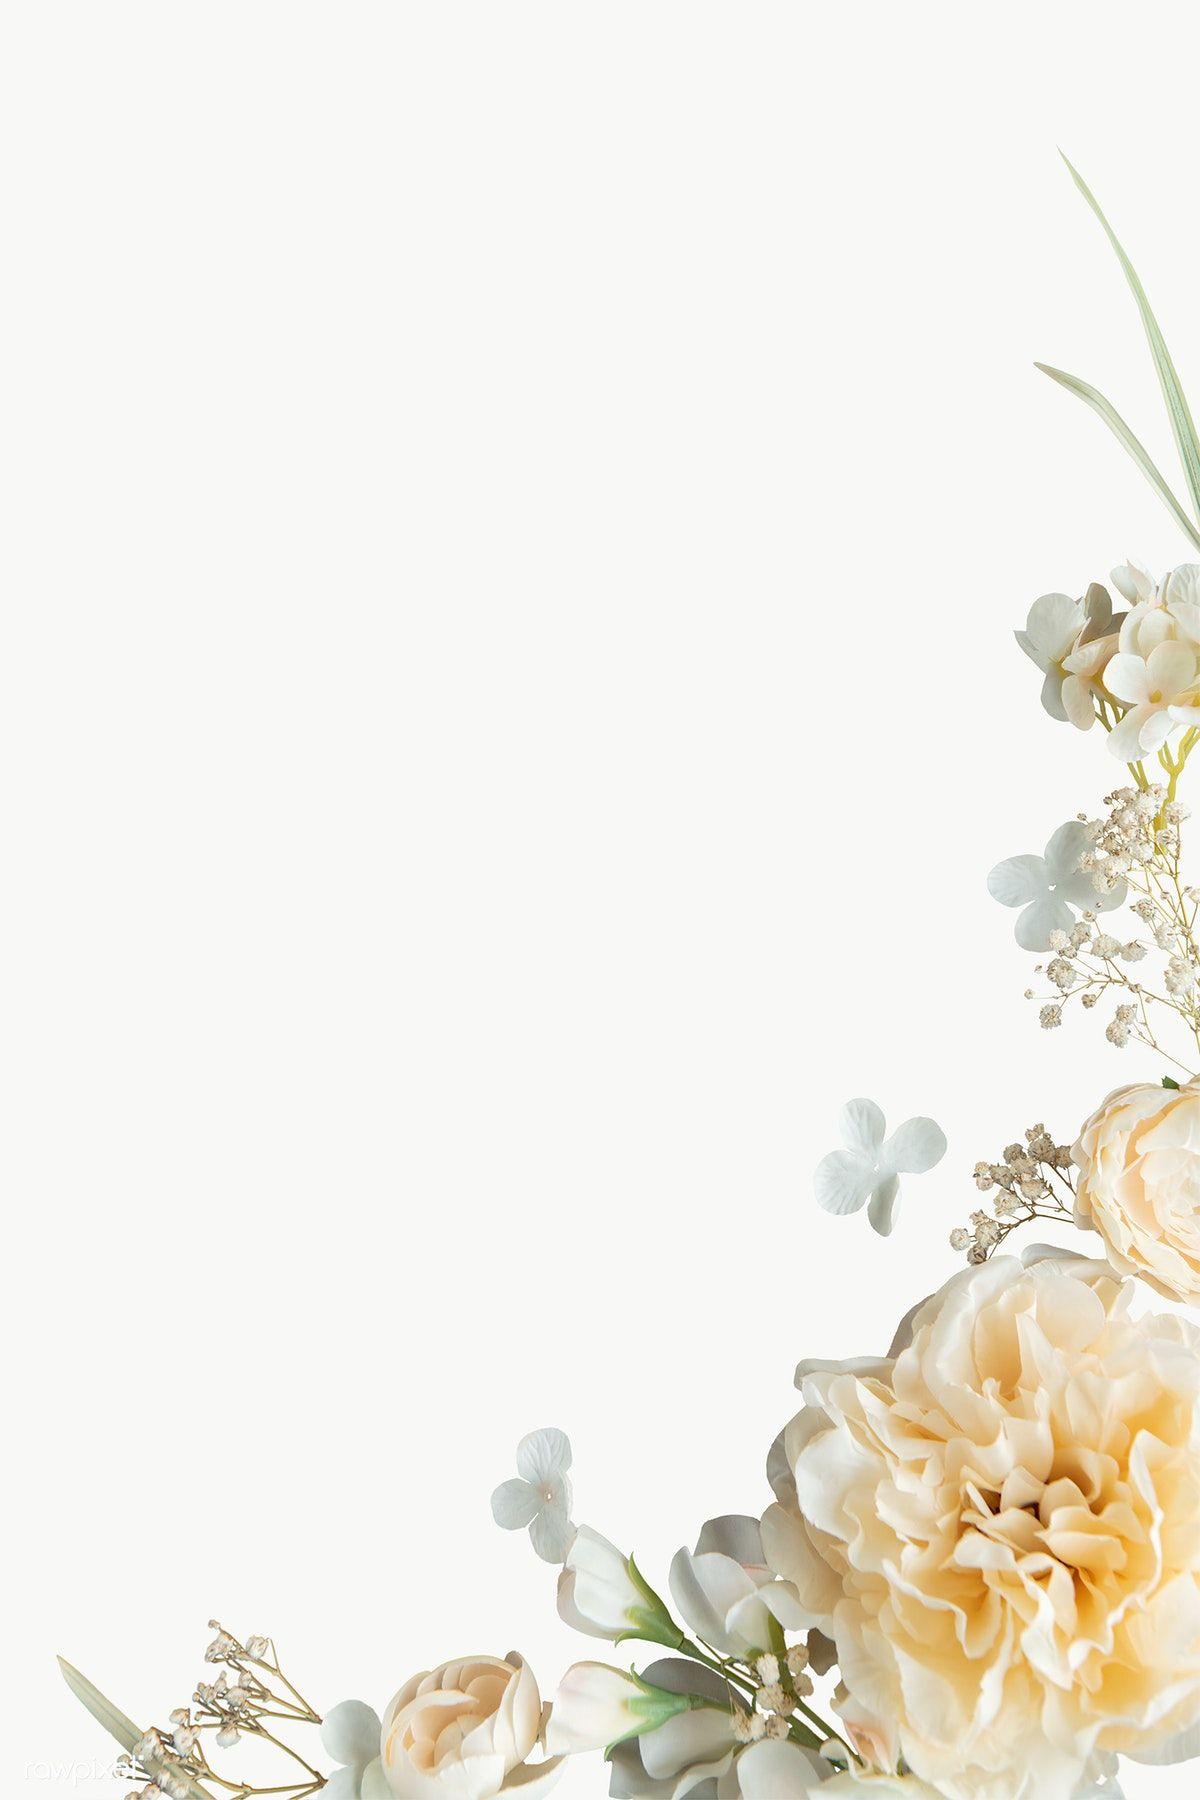 Light Yellow Peonies Pattern Transparent Png Premium Image By Rawpixel Com Nam White Flower Png Yellow Peonies Flower Logo Design